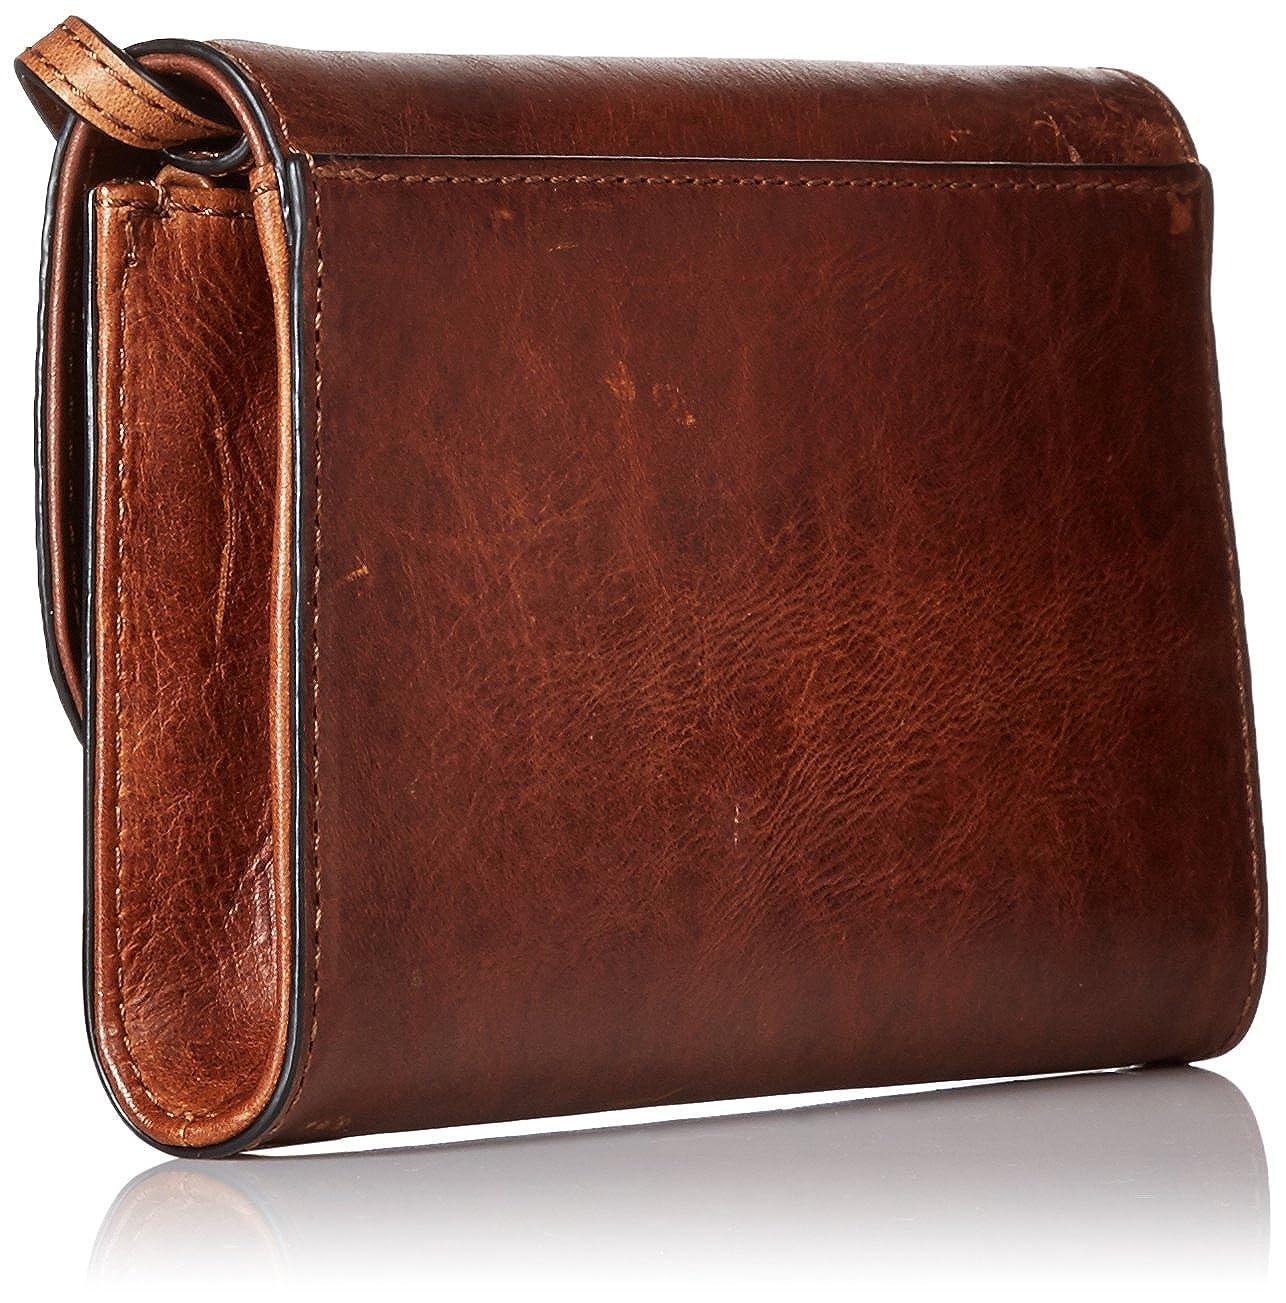 Melissa Wallet Crossbody Clutch Leather Bag  Amazon.co.uk  Shoes   Bags cc5ef0d9e4a5a